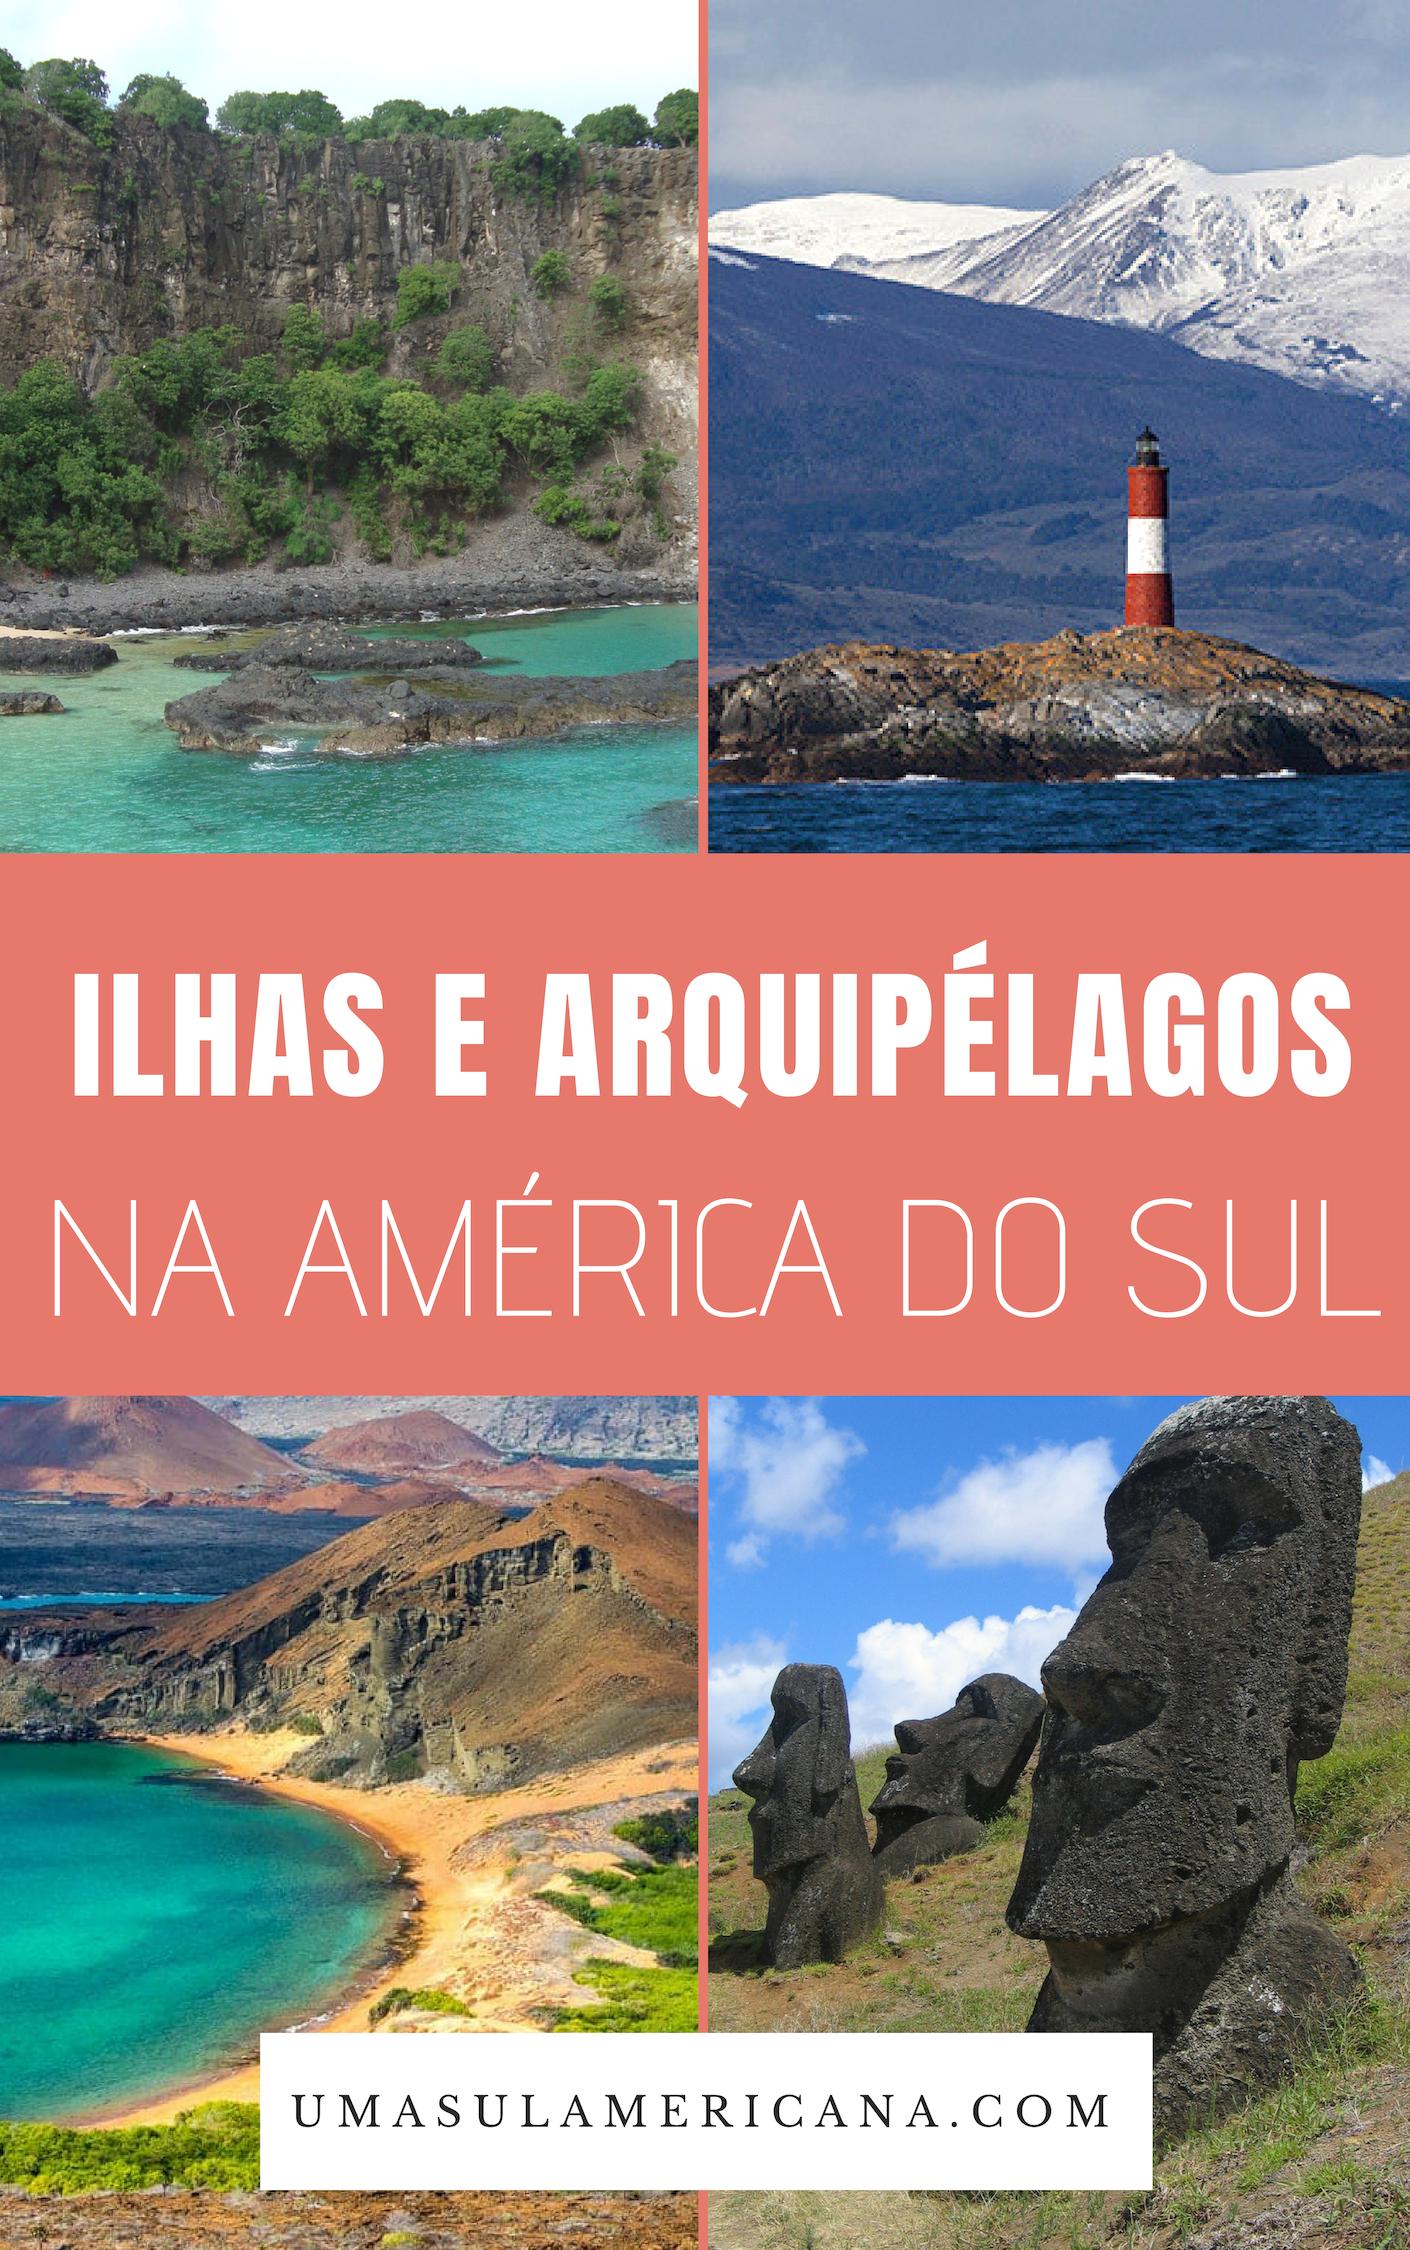 Ilhas e arquipélagos na América do Sul, como Fernando de Noronha, Ilha de Páscoa, Galápagos, Terra do Fogo e muito mais